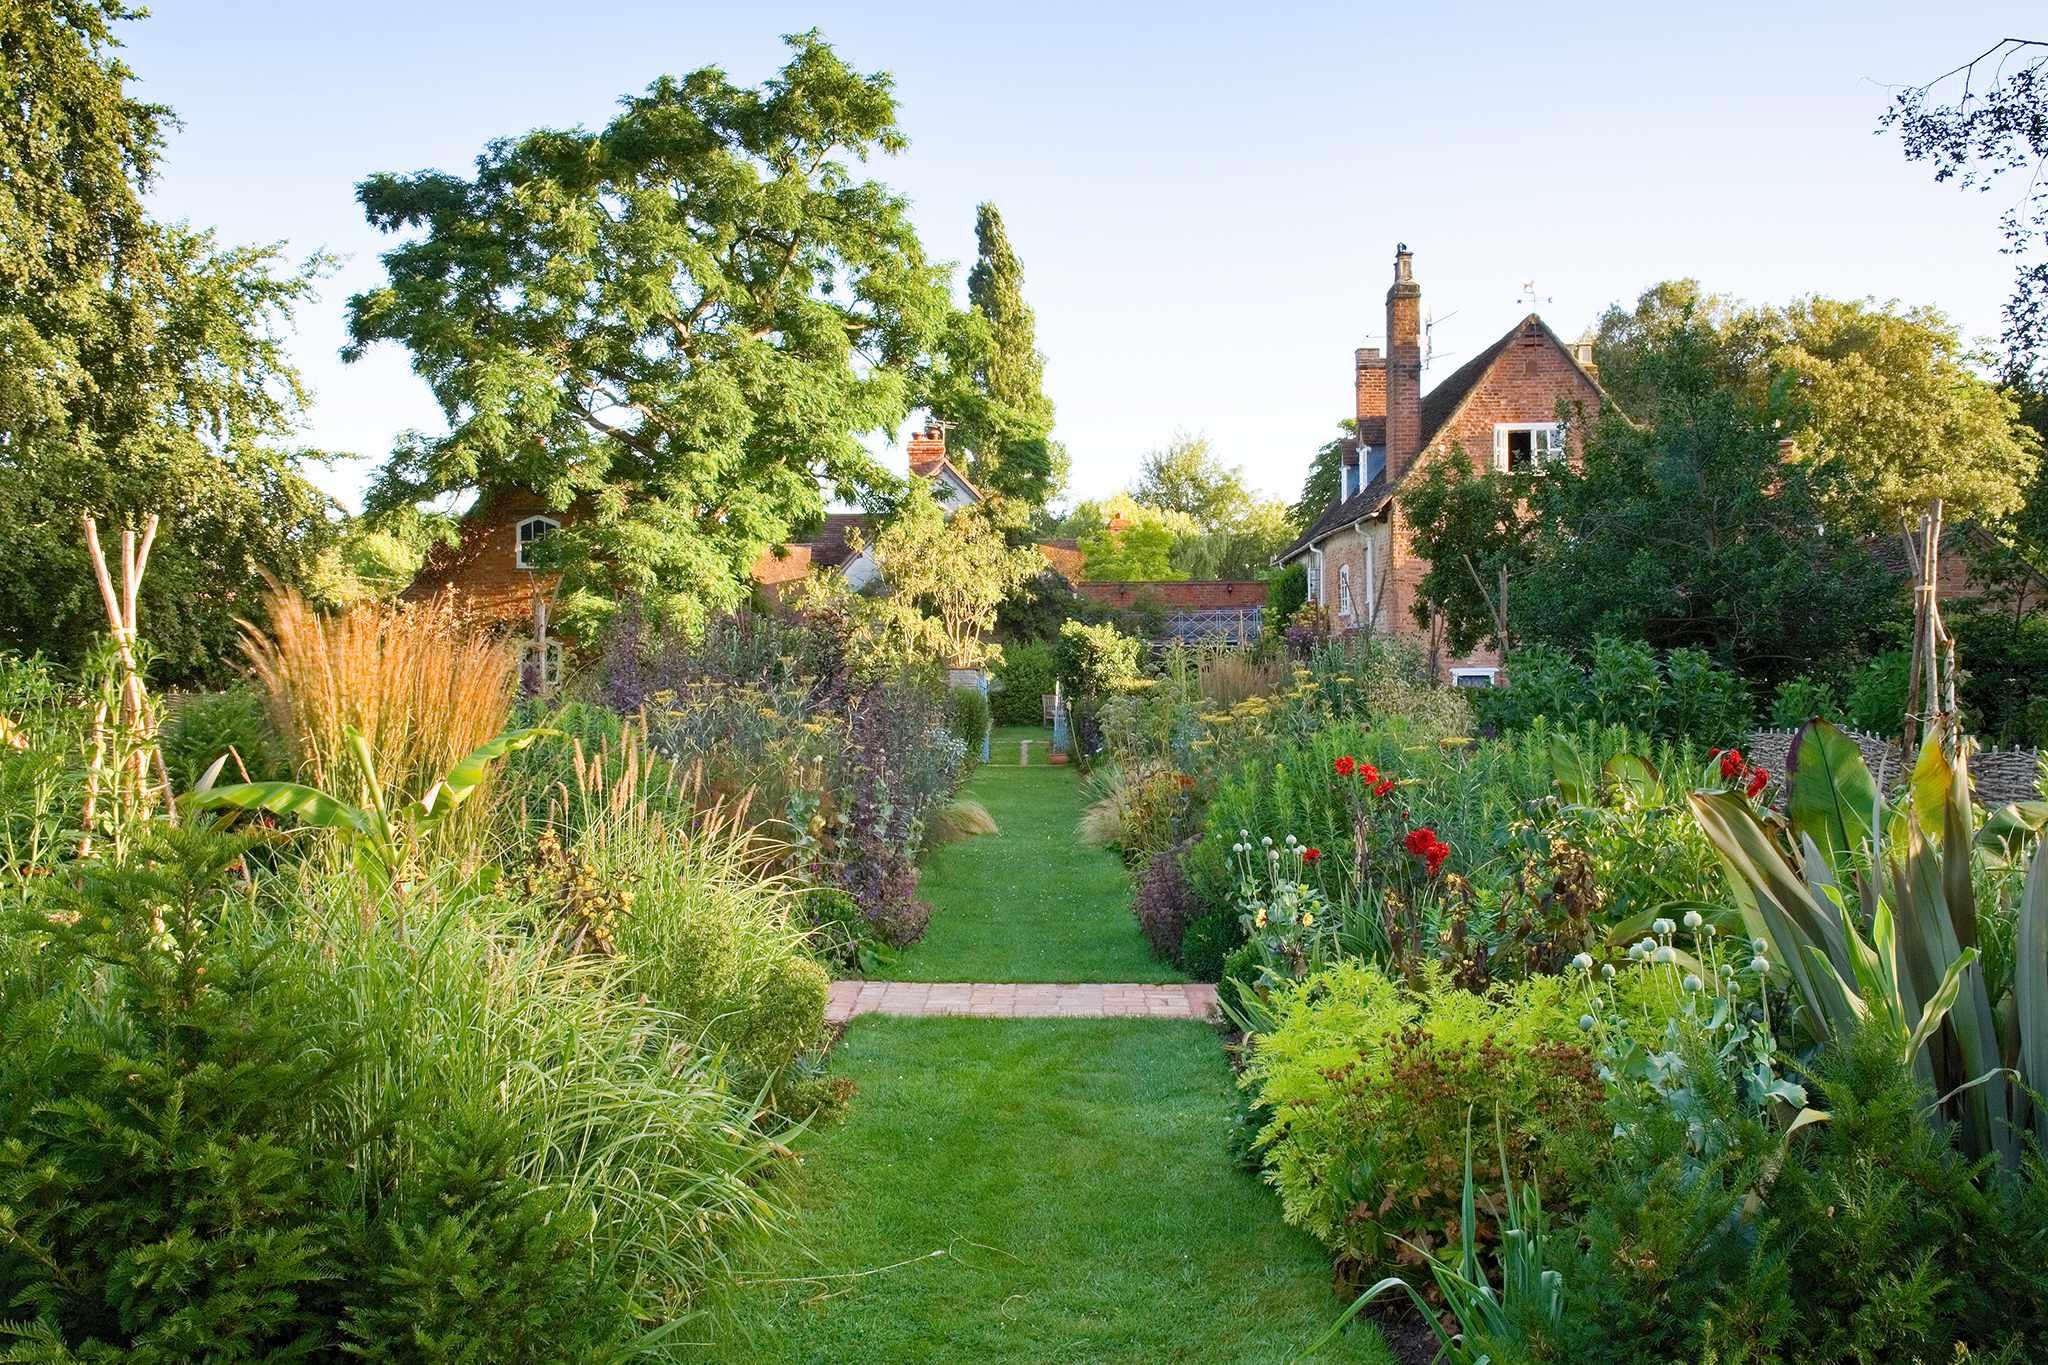 2048x1365-Country-garden-style-planting-LI612481